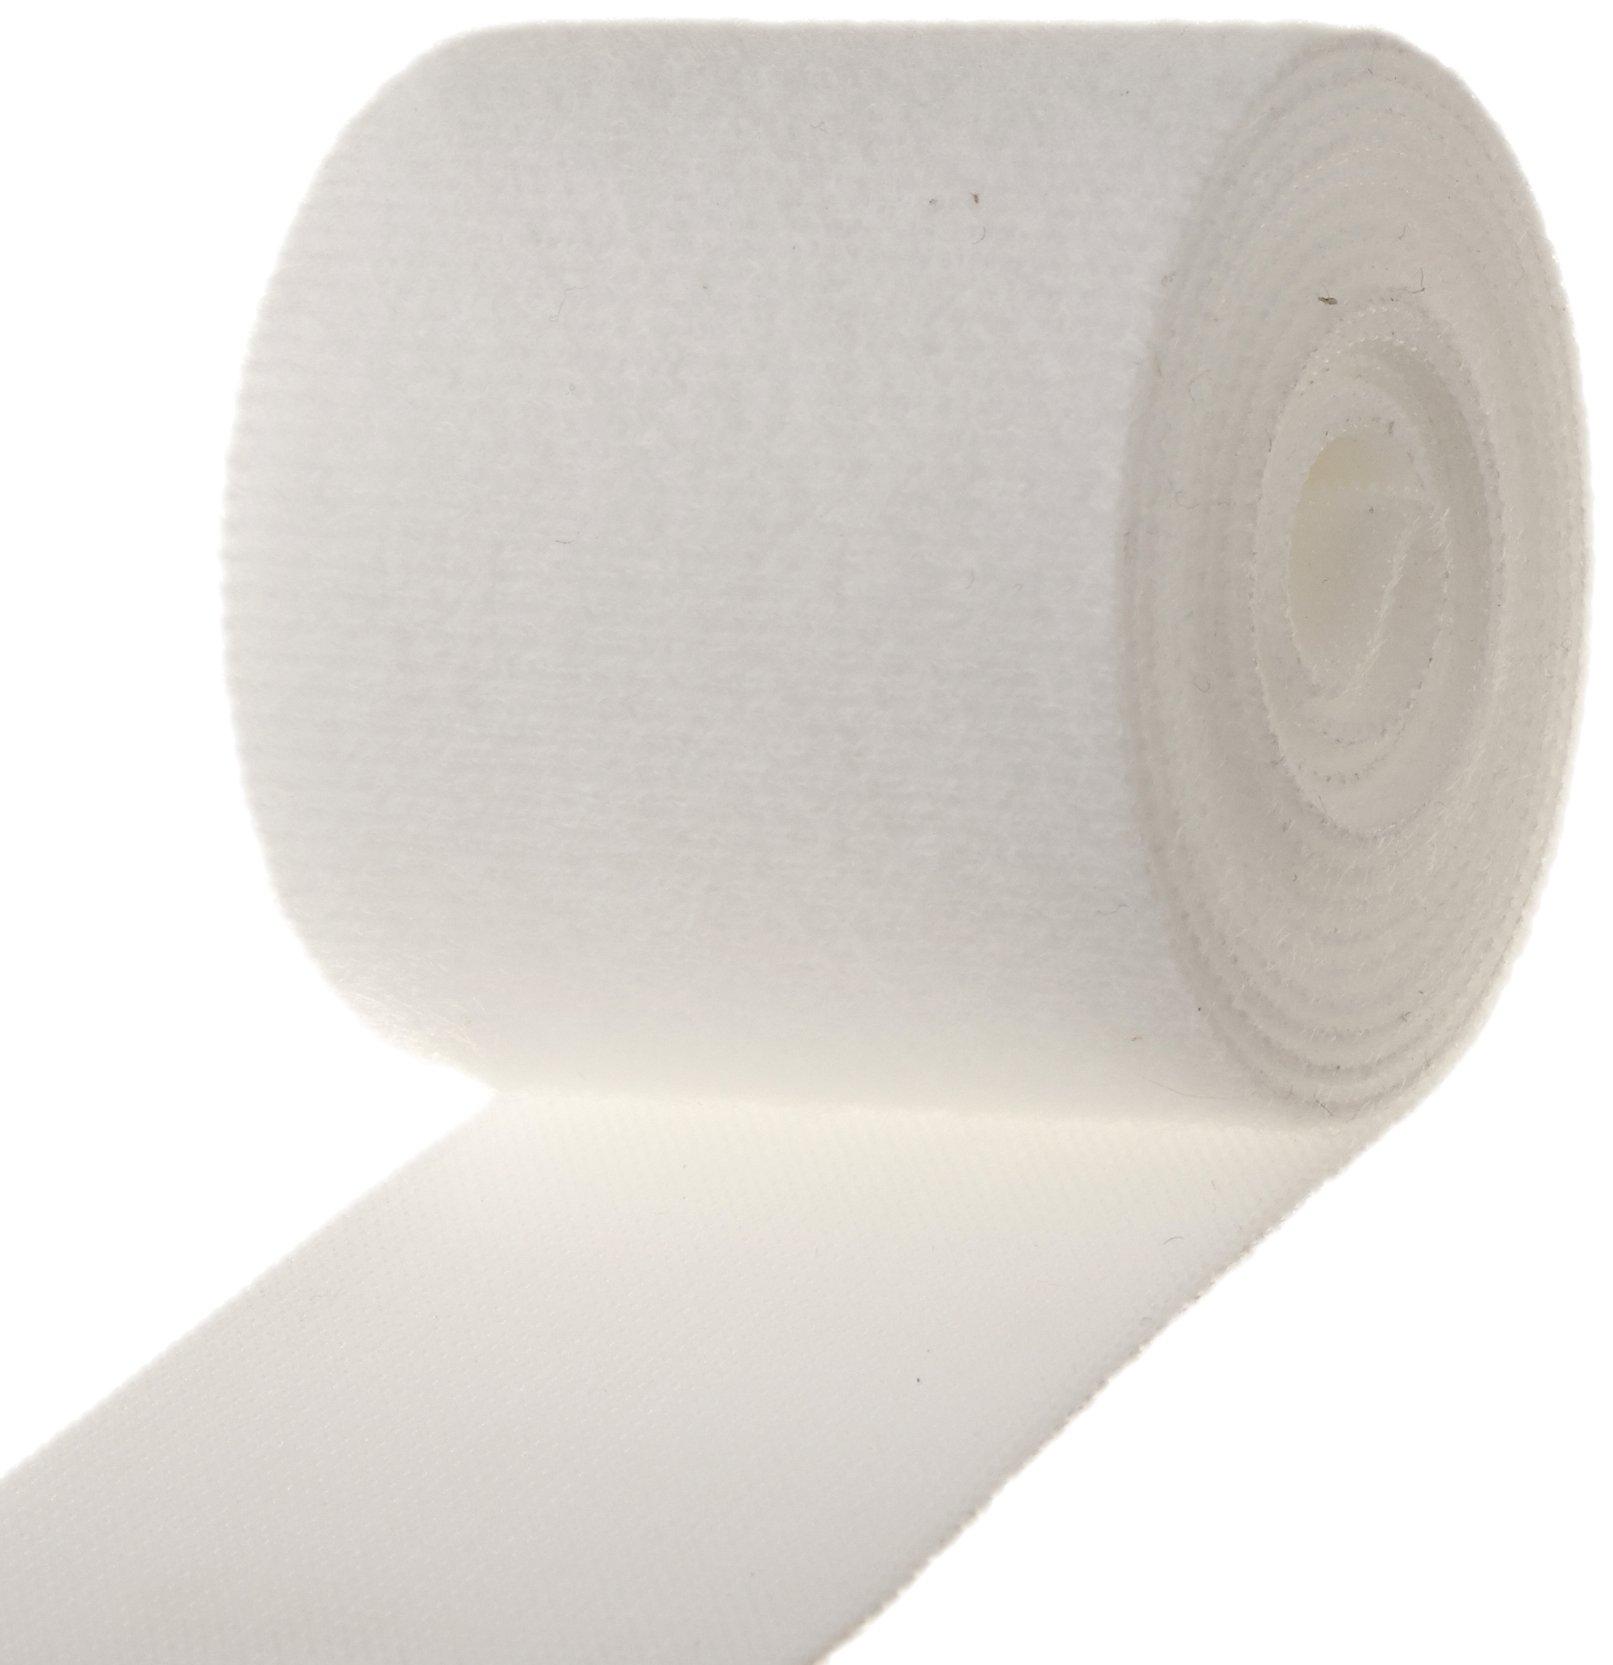 VELCRO White Nylon Velcro Onewrap Strap, Hook and Loop, 2'' Wide, 5' Length